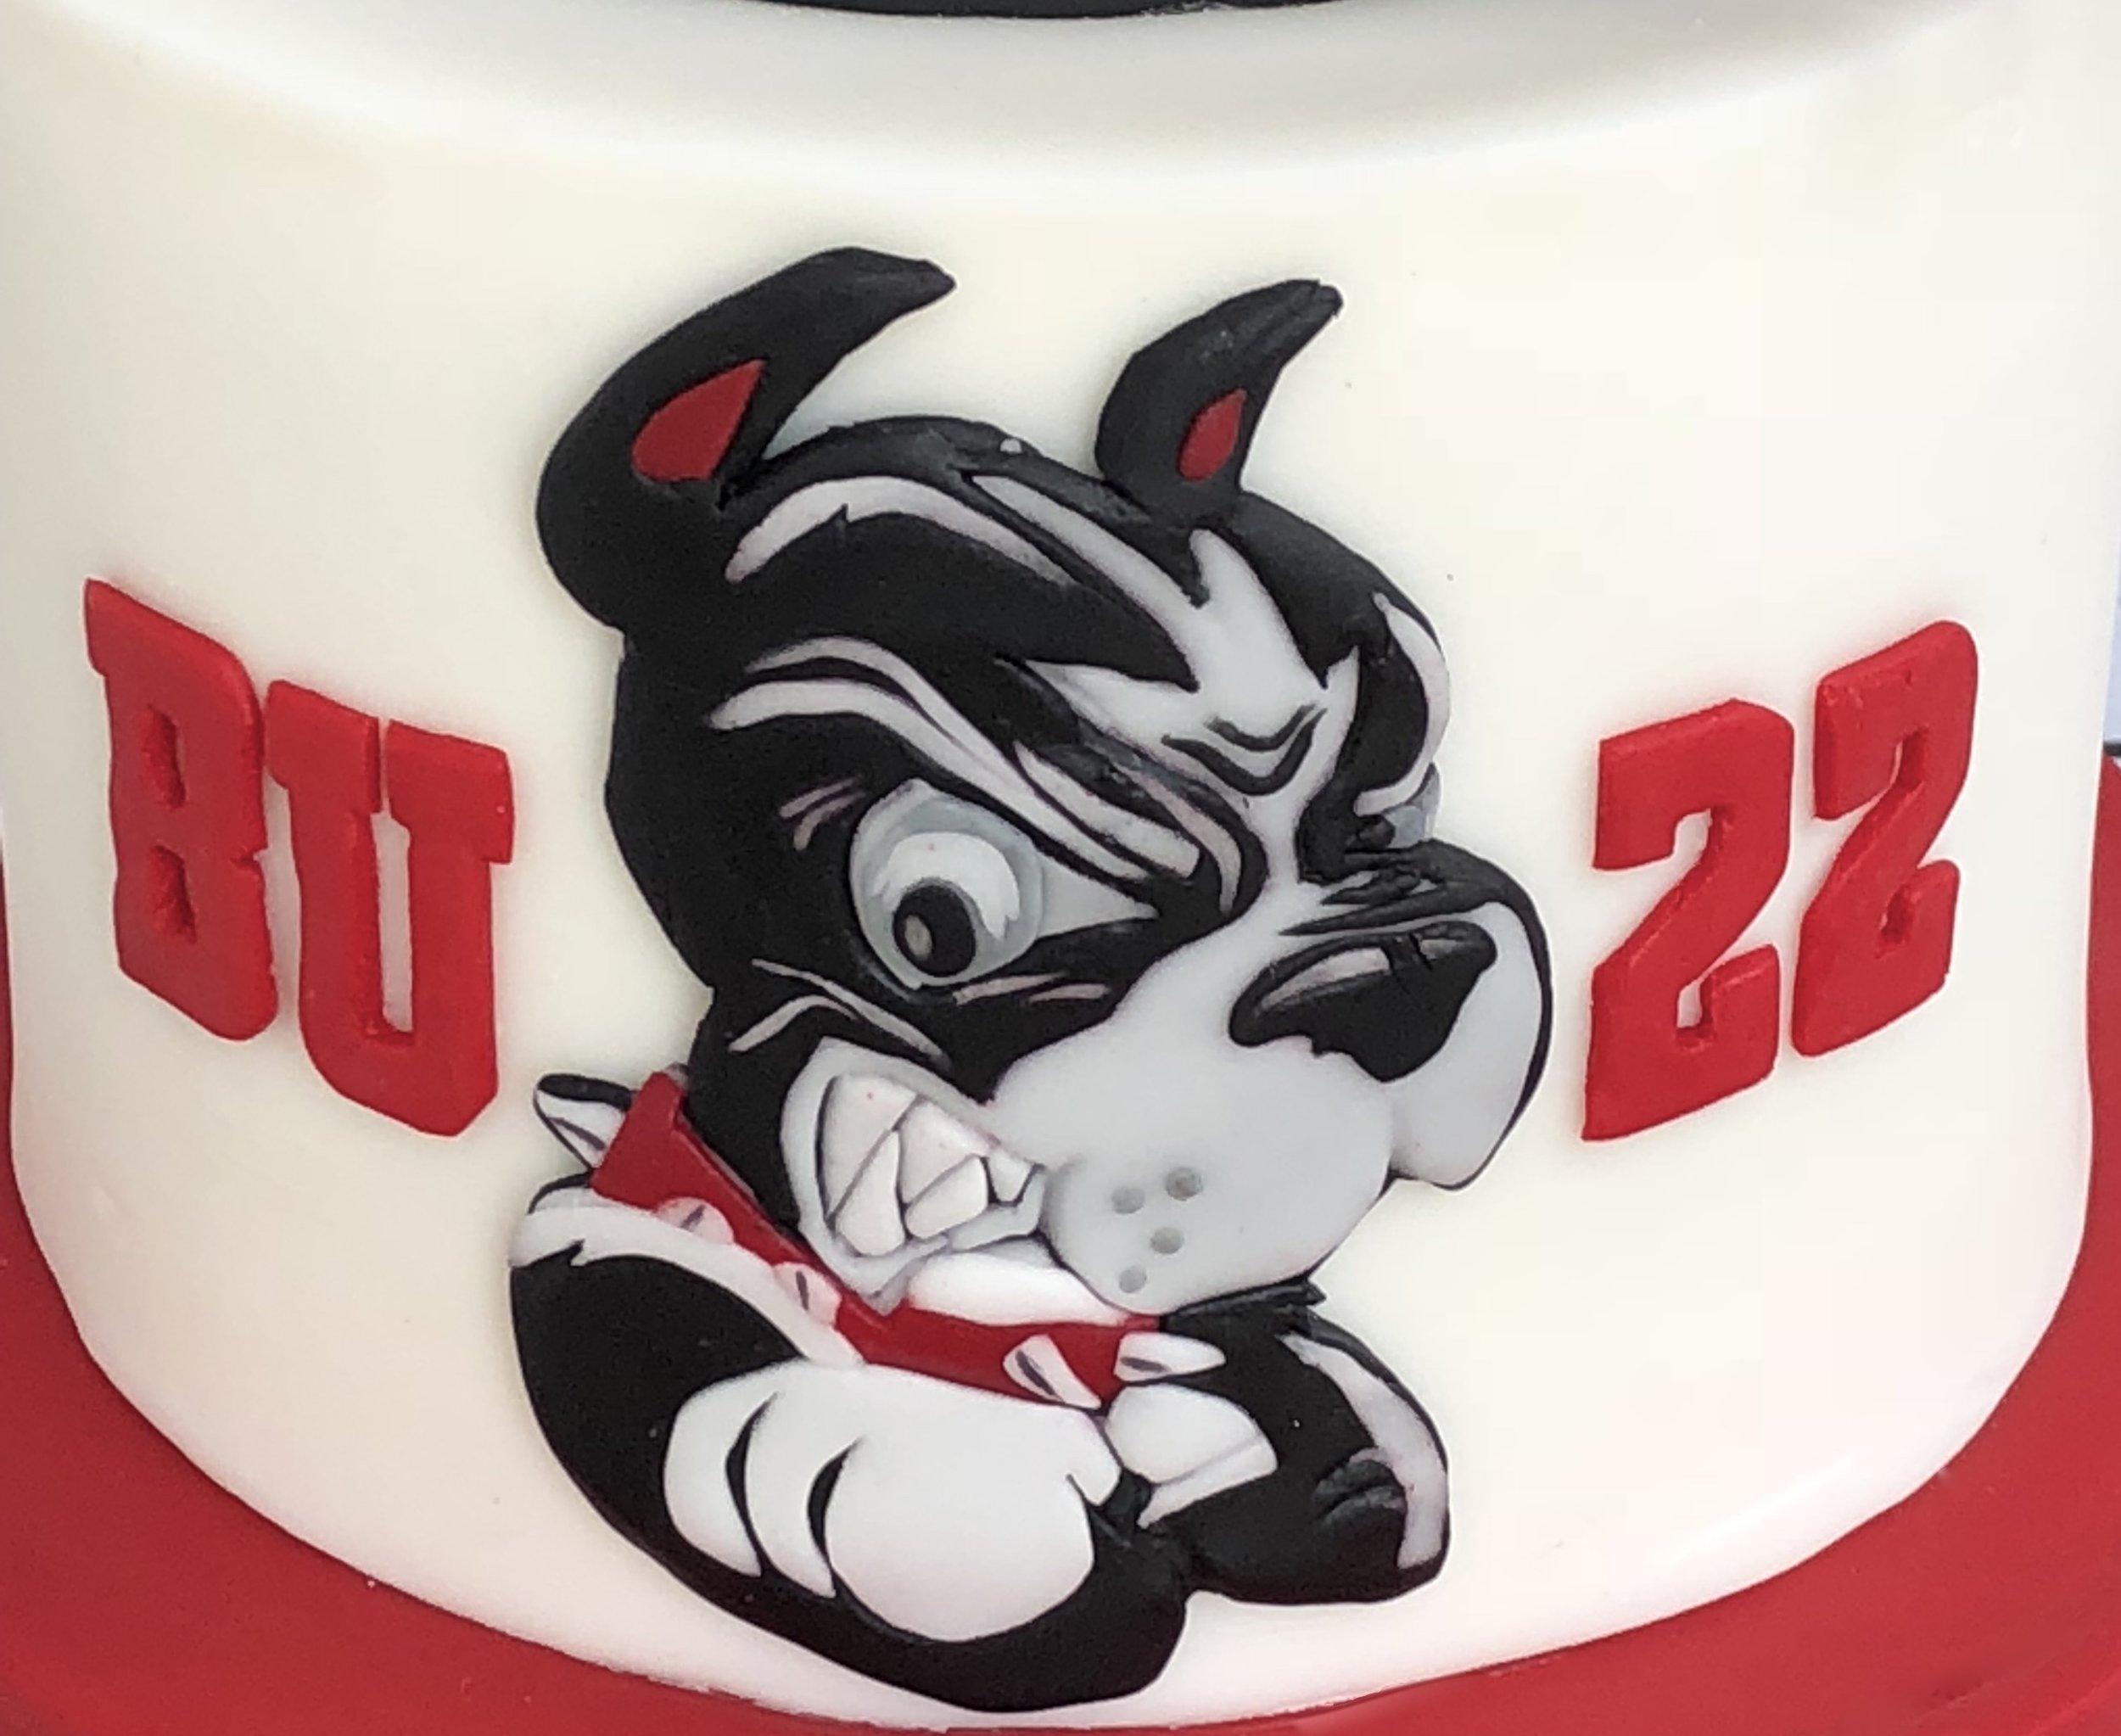 Hand-cut BU Terrier logo